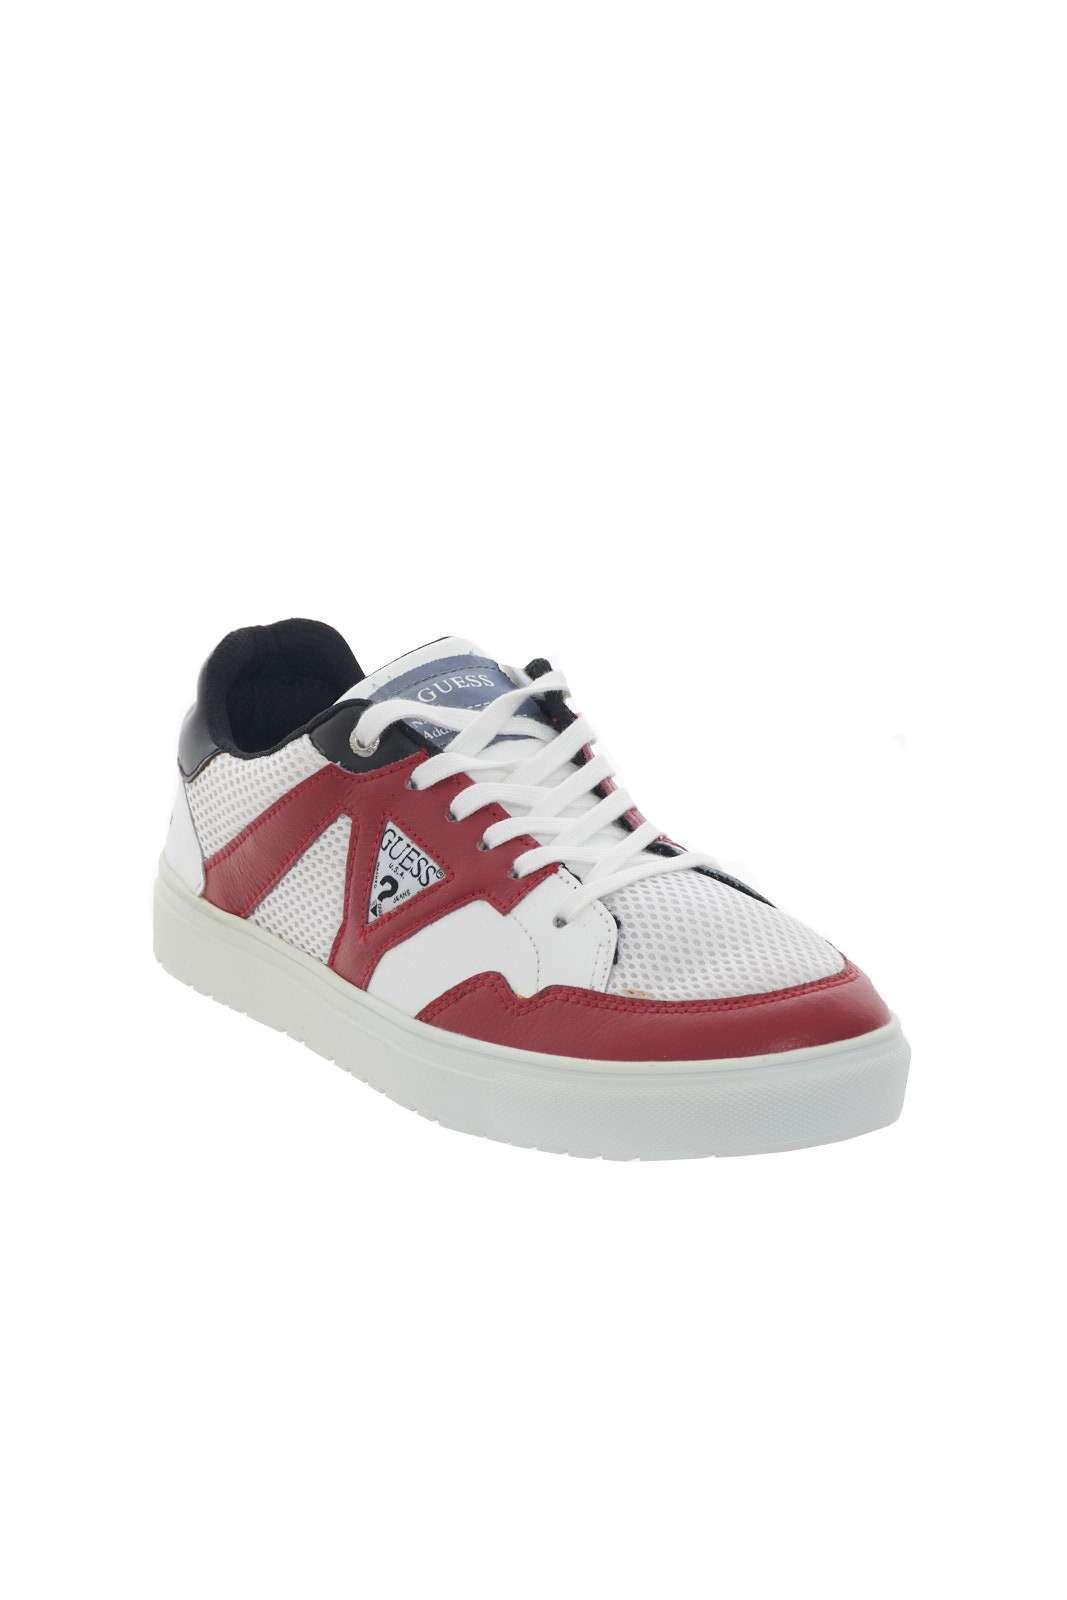 https://www.parmax.com/media/catalog/product/a/i/PE-outlet_parmax-sneaker-uomo-Guess-FM5BRILEA12-B_1.jpg